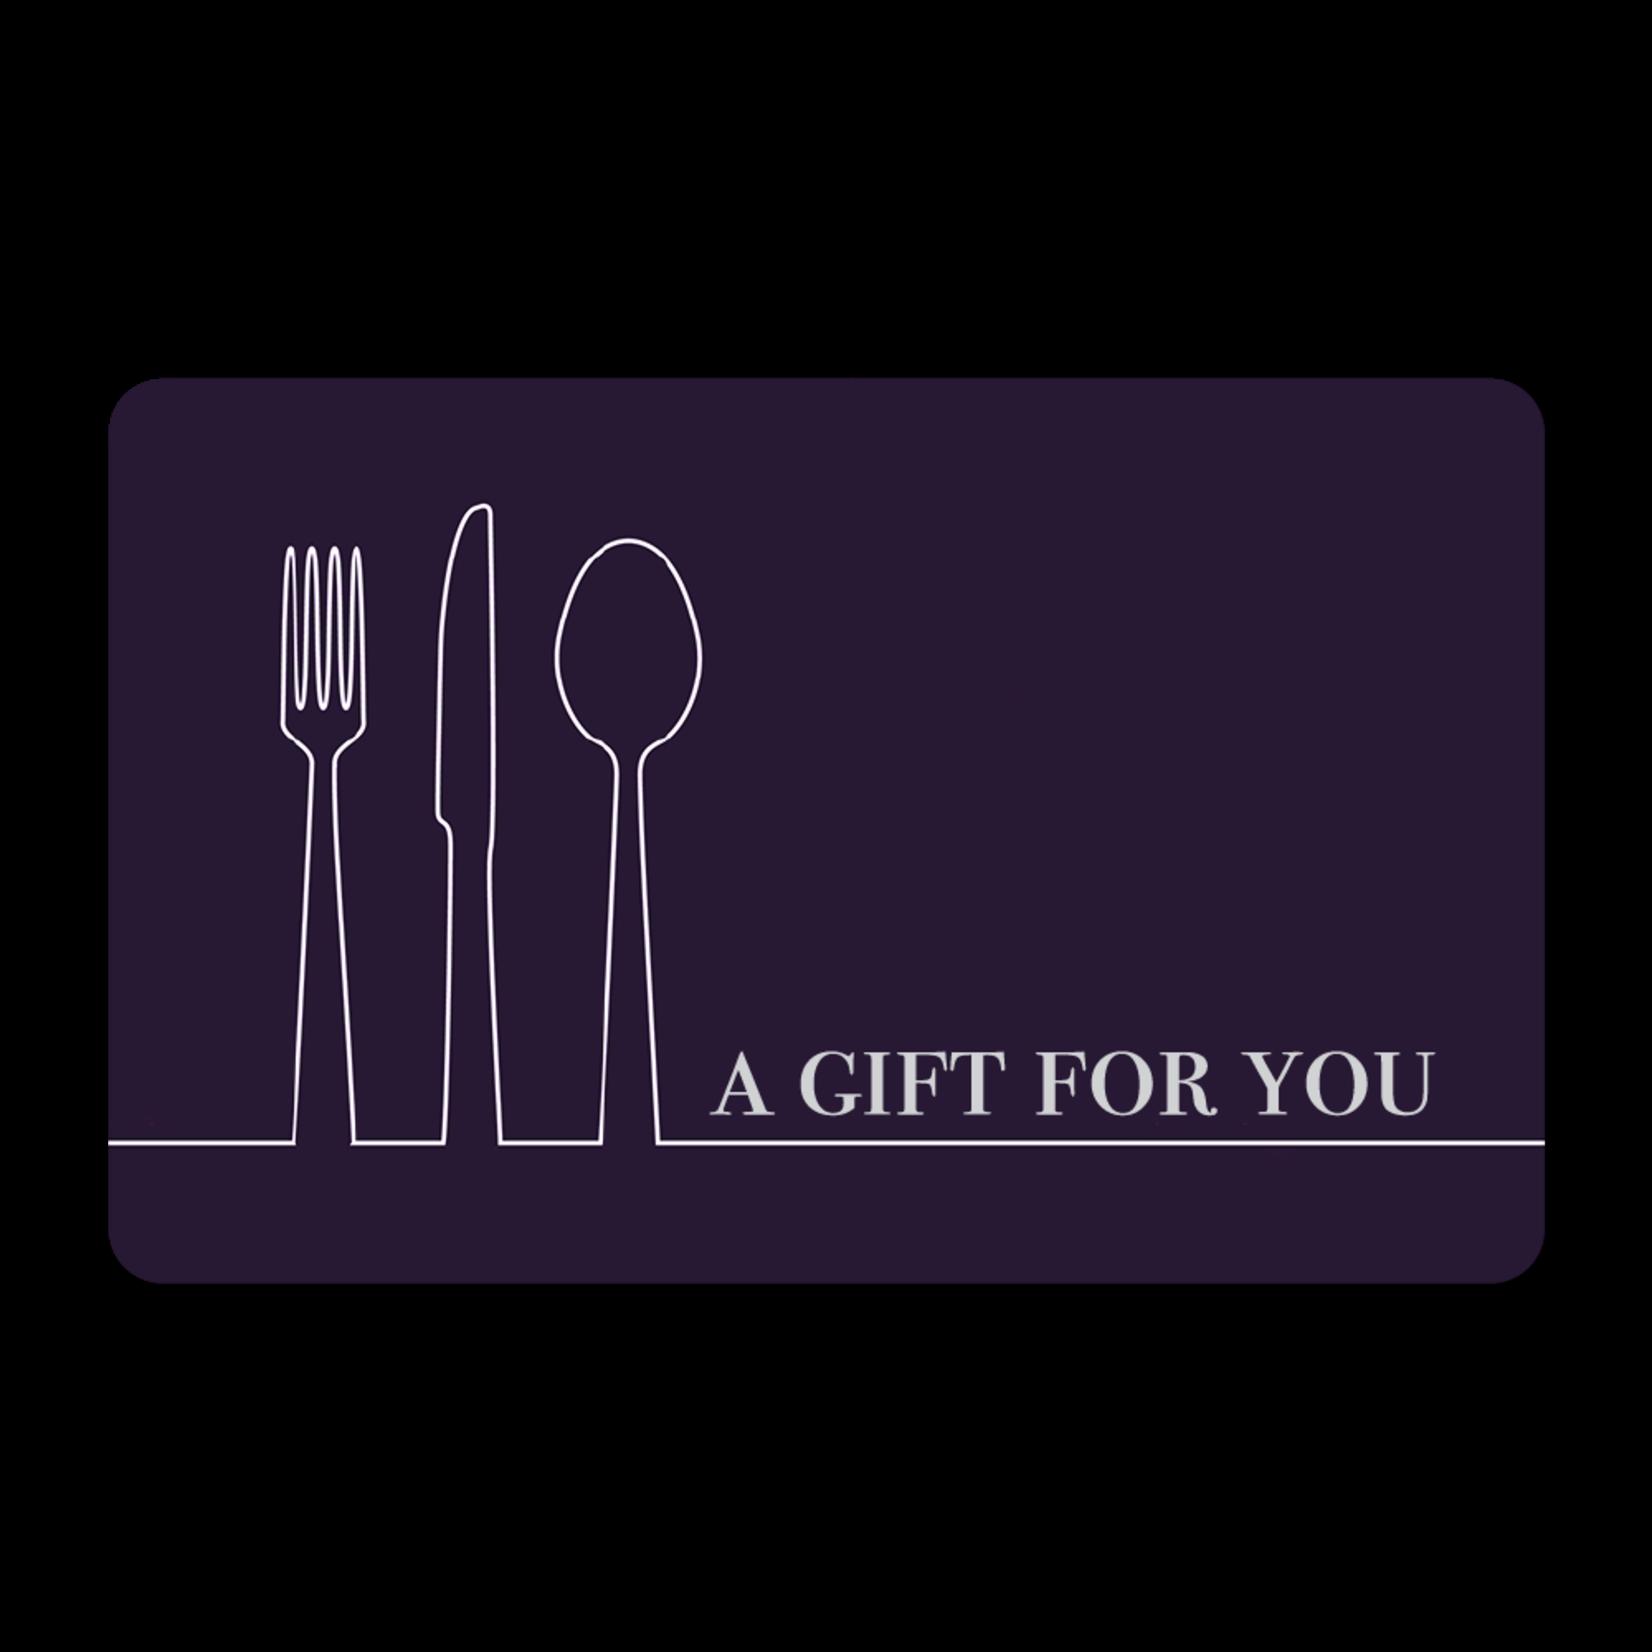 Gift Cards - Purple Utensils